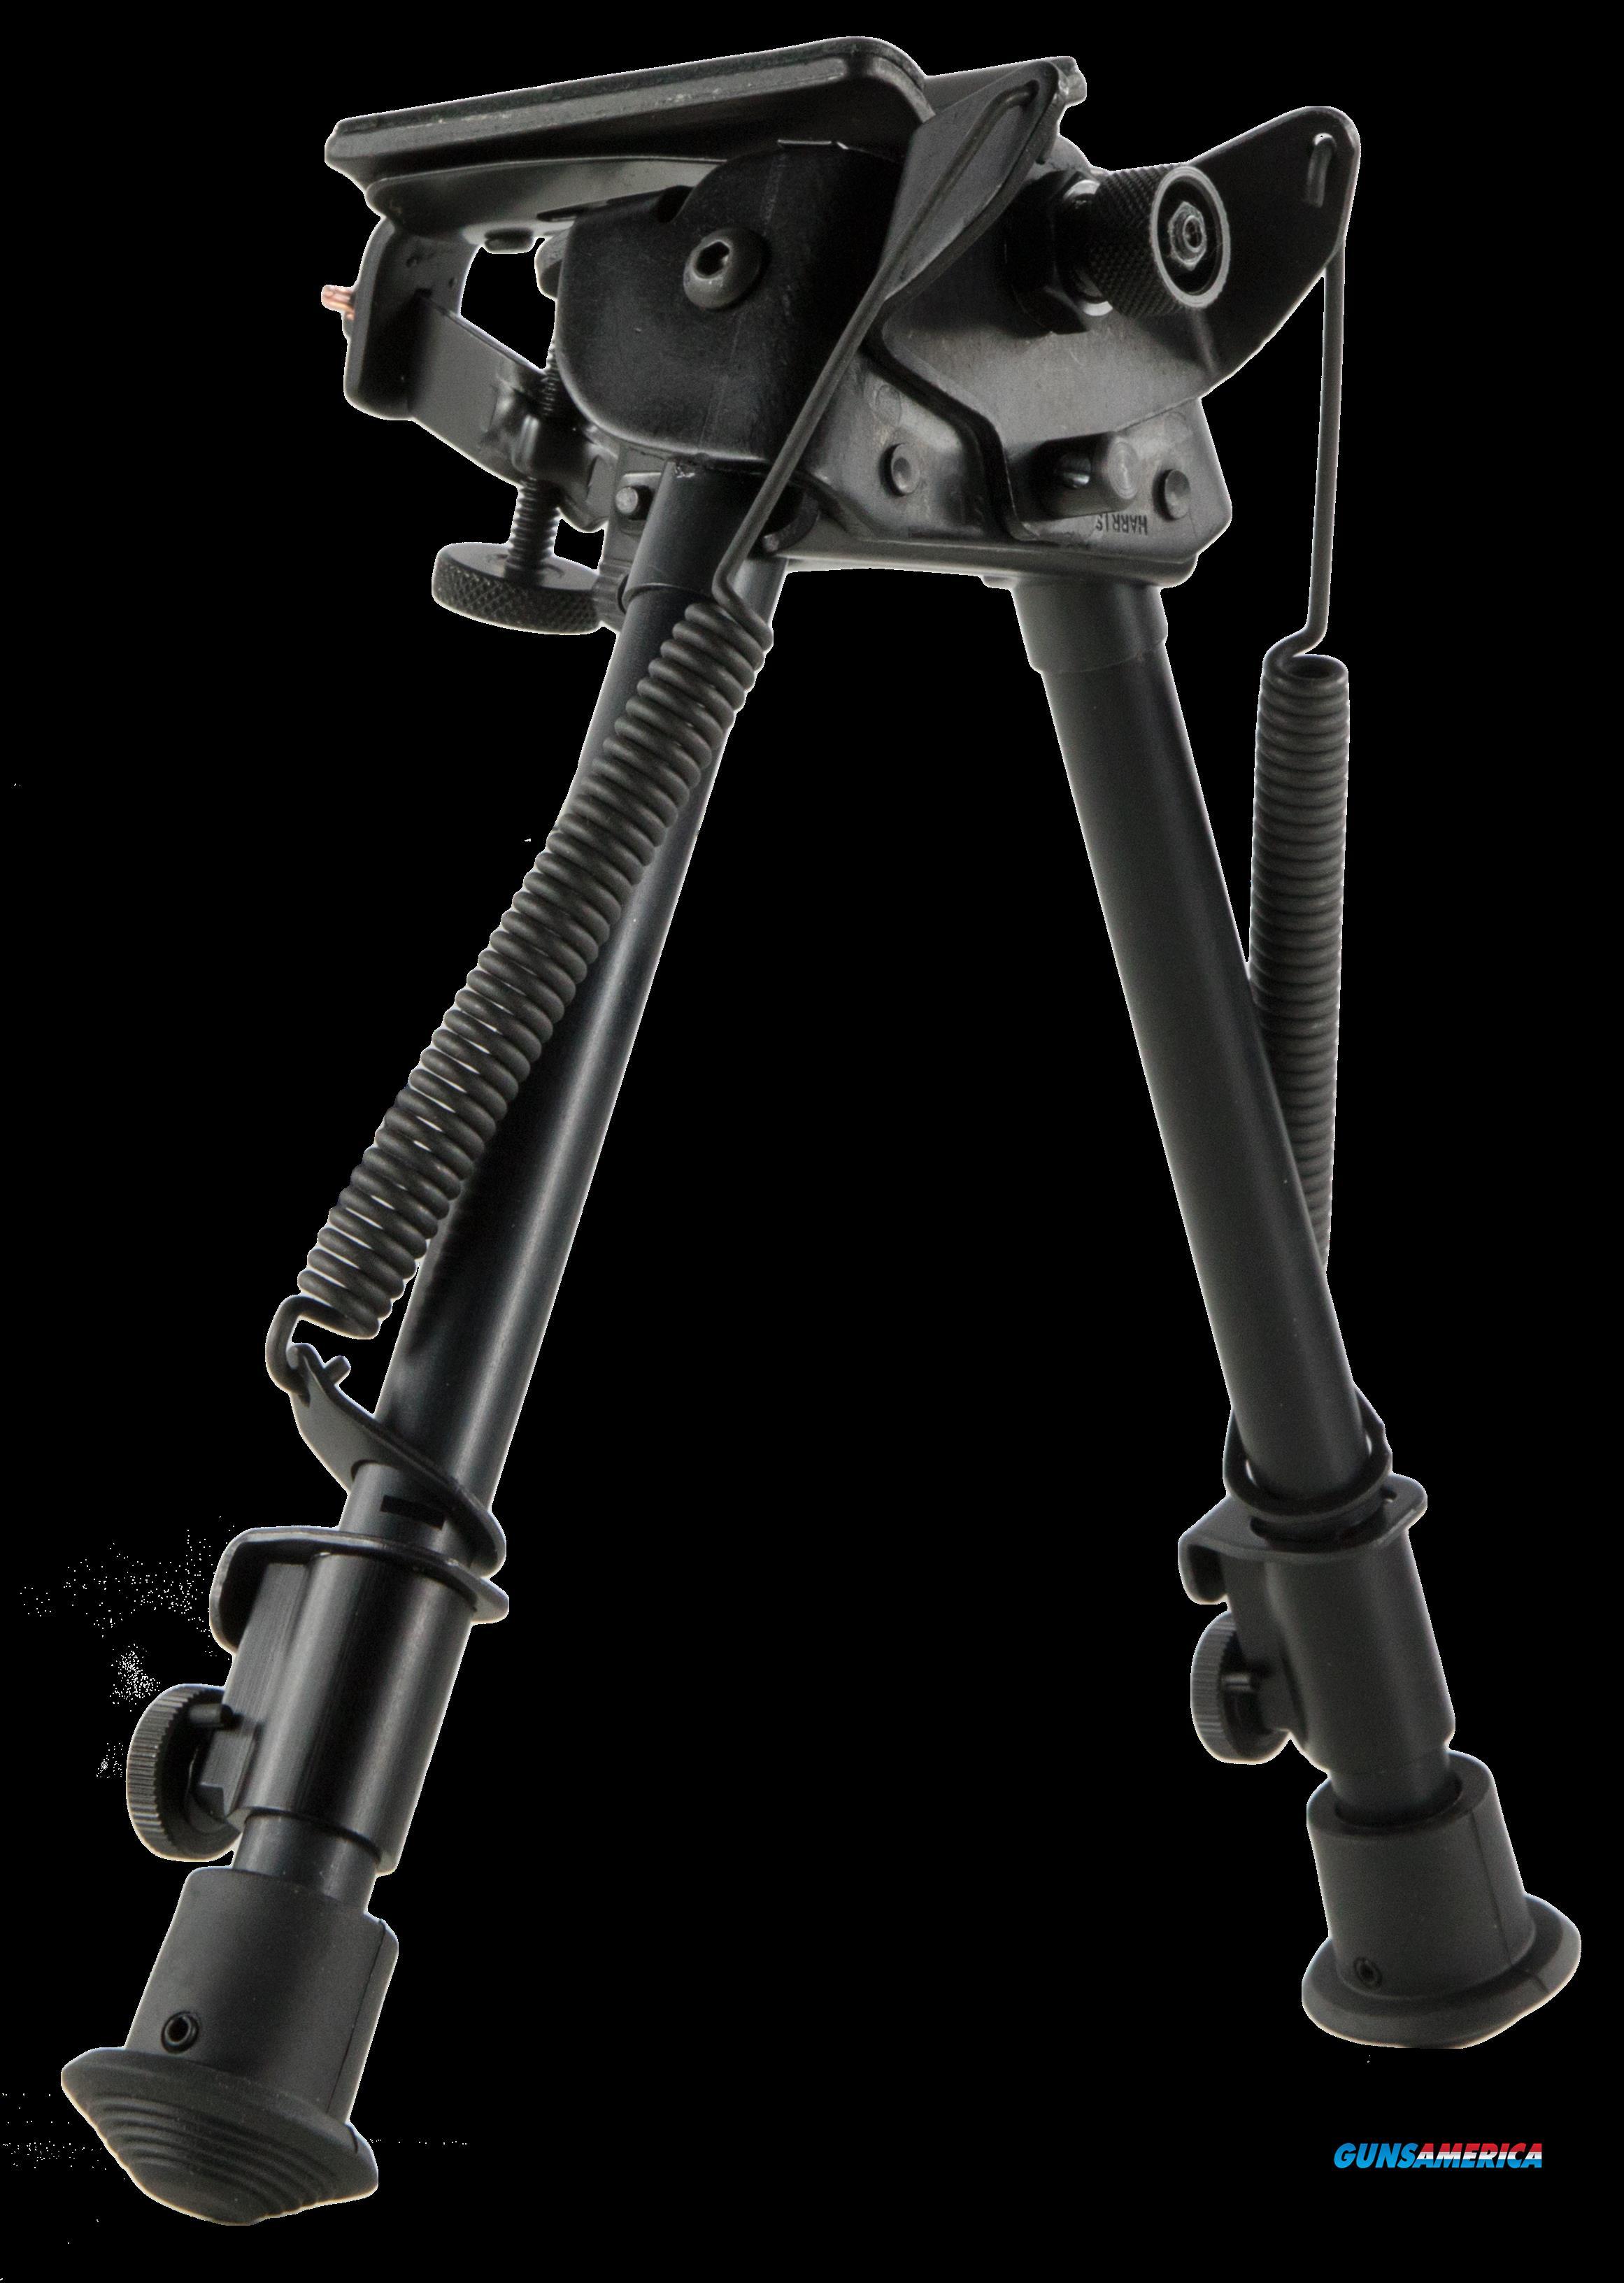 Harris Bl, Harris Model L  Series S    9-12 Bipod  Guns > Pistols > 1911 Pistol Copies (non-Colt)